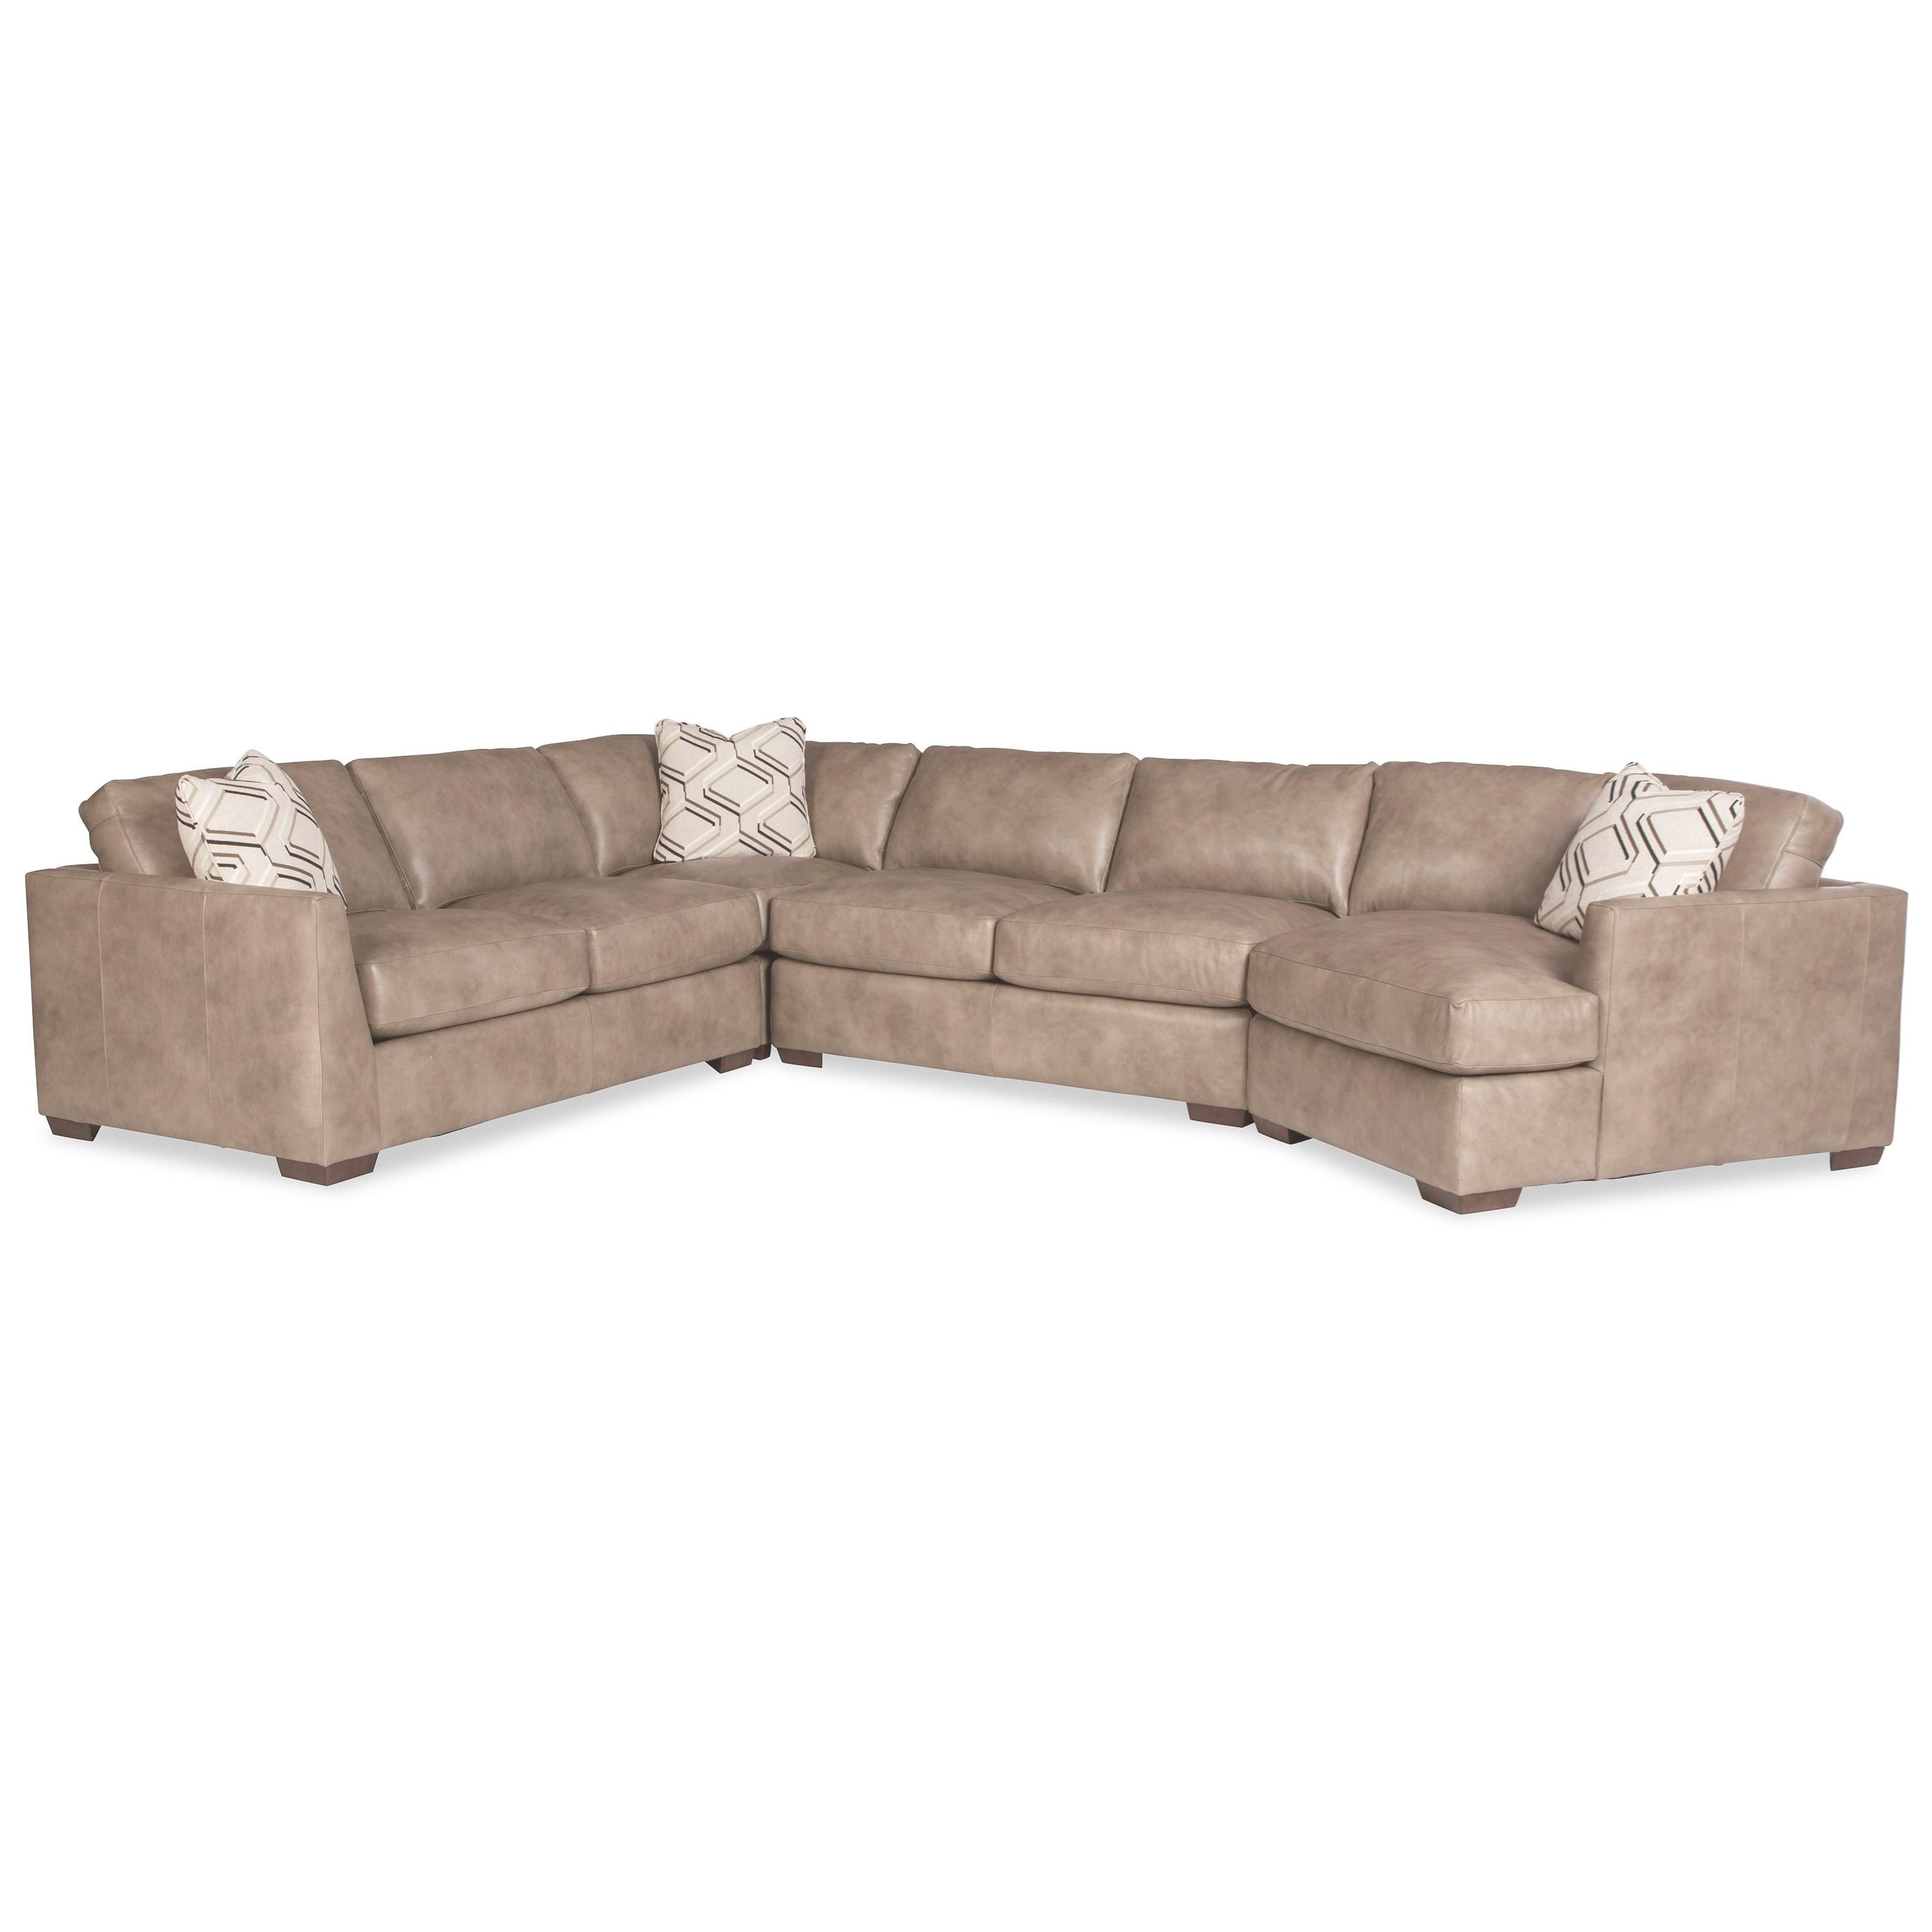 L783950 5-Seat Sectional Sofa w/RAF Cuddler & Pillow by Craftmaster at Suburban Furniture